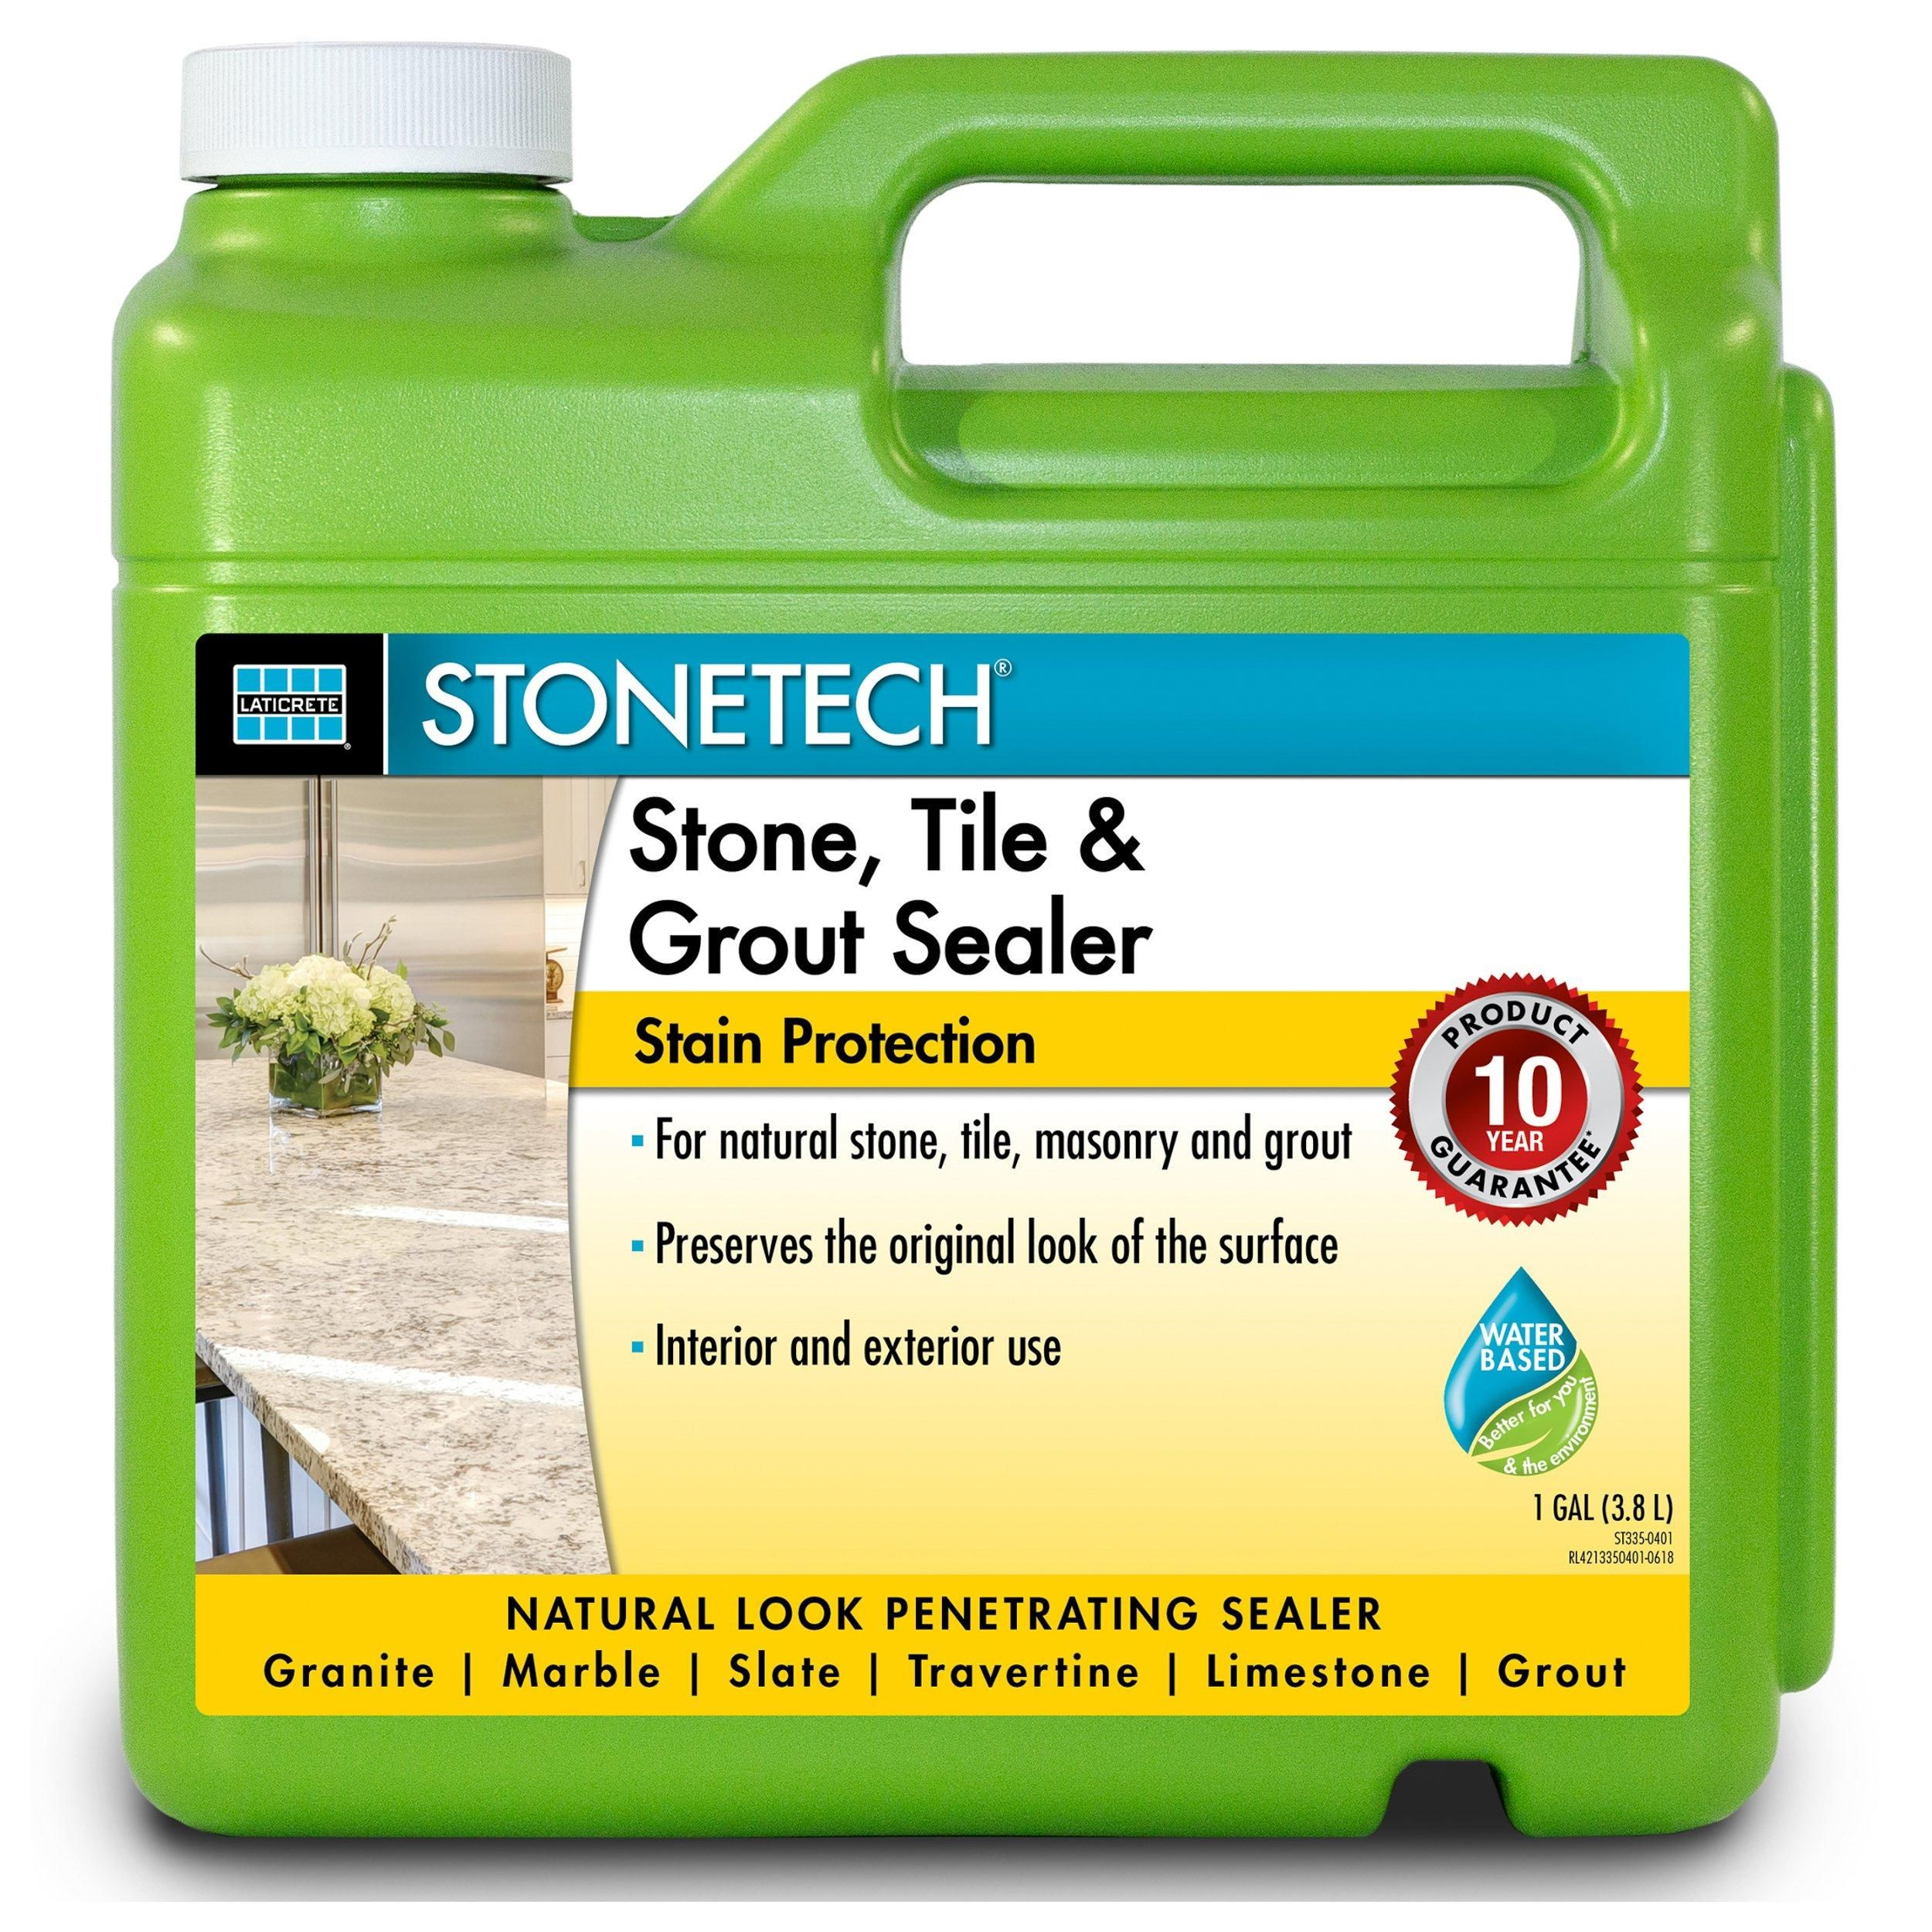 Laticrete Stonetech Stone Tile And Grout Sealer In 2020 Grout Sealer Concrete Floor Coatings Sealer